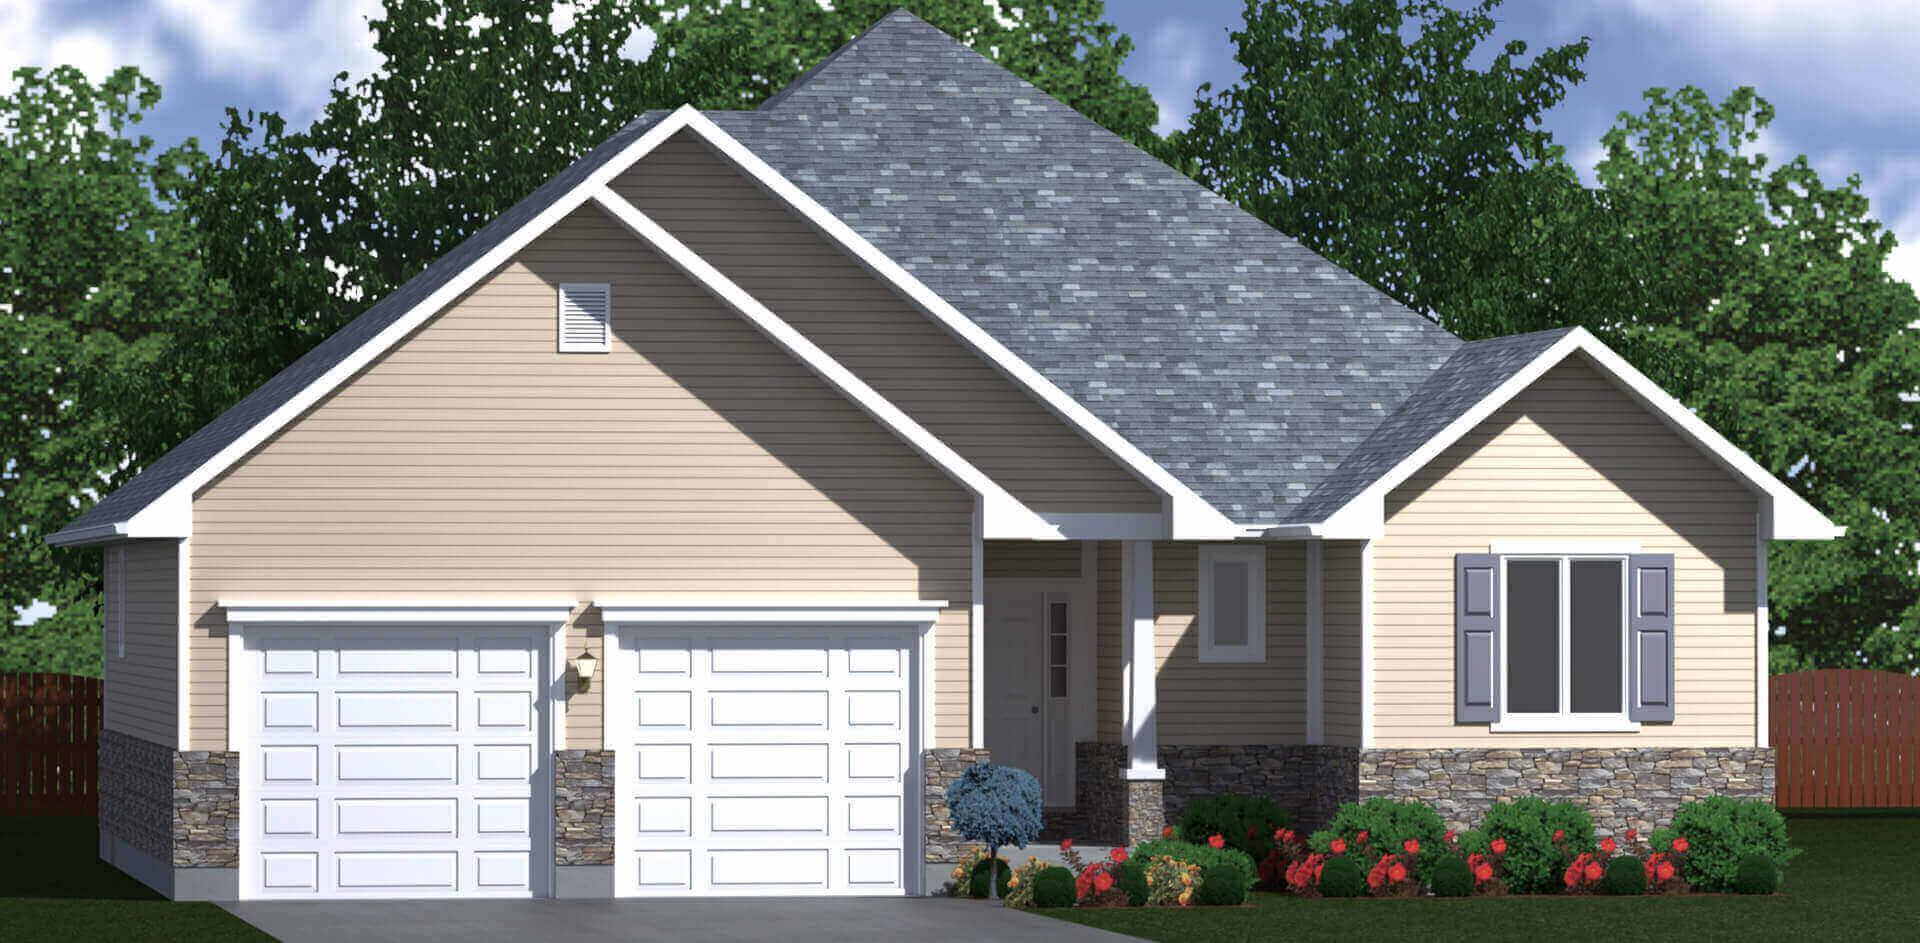 1766 house exterior